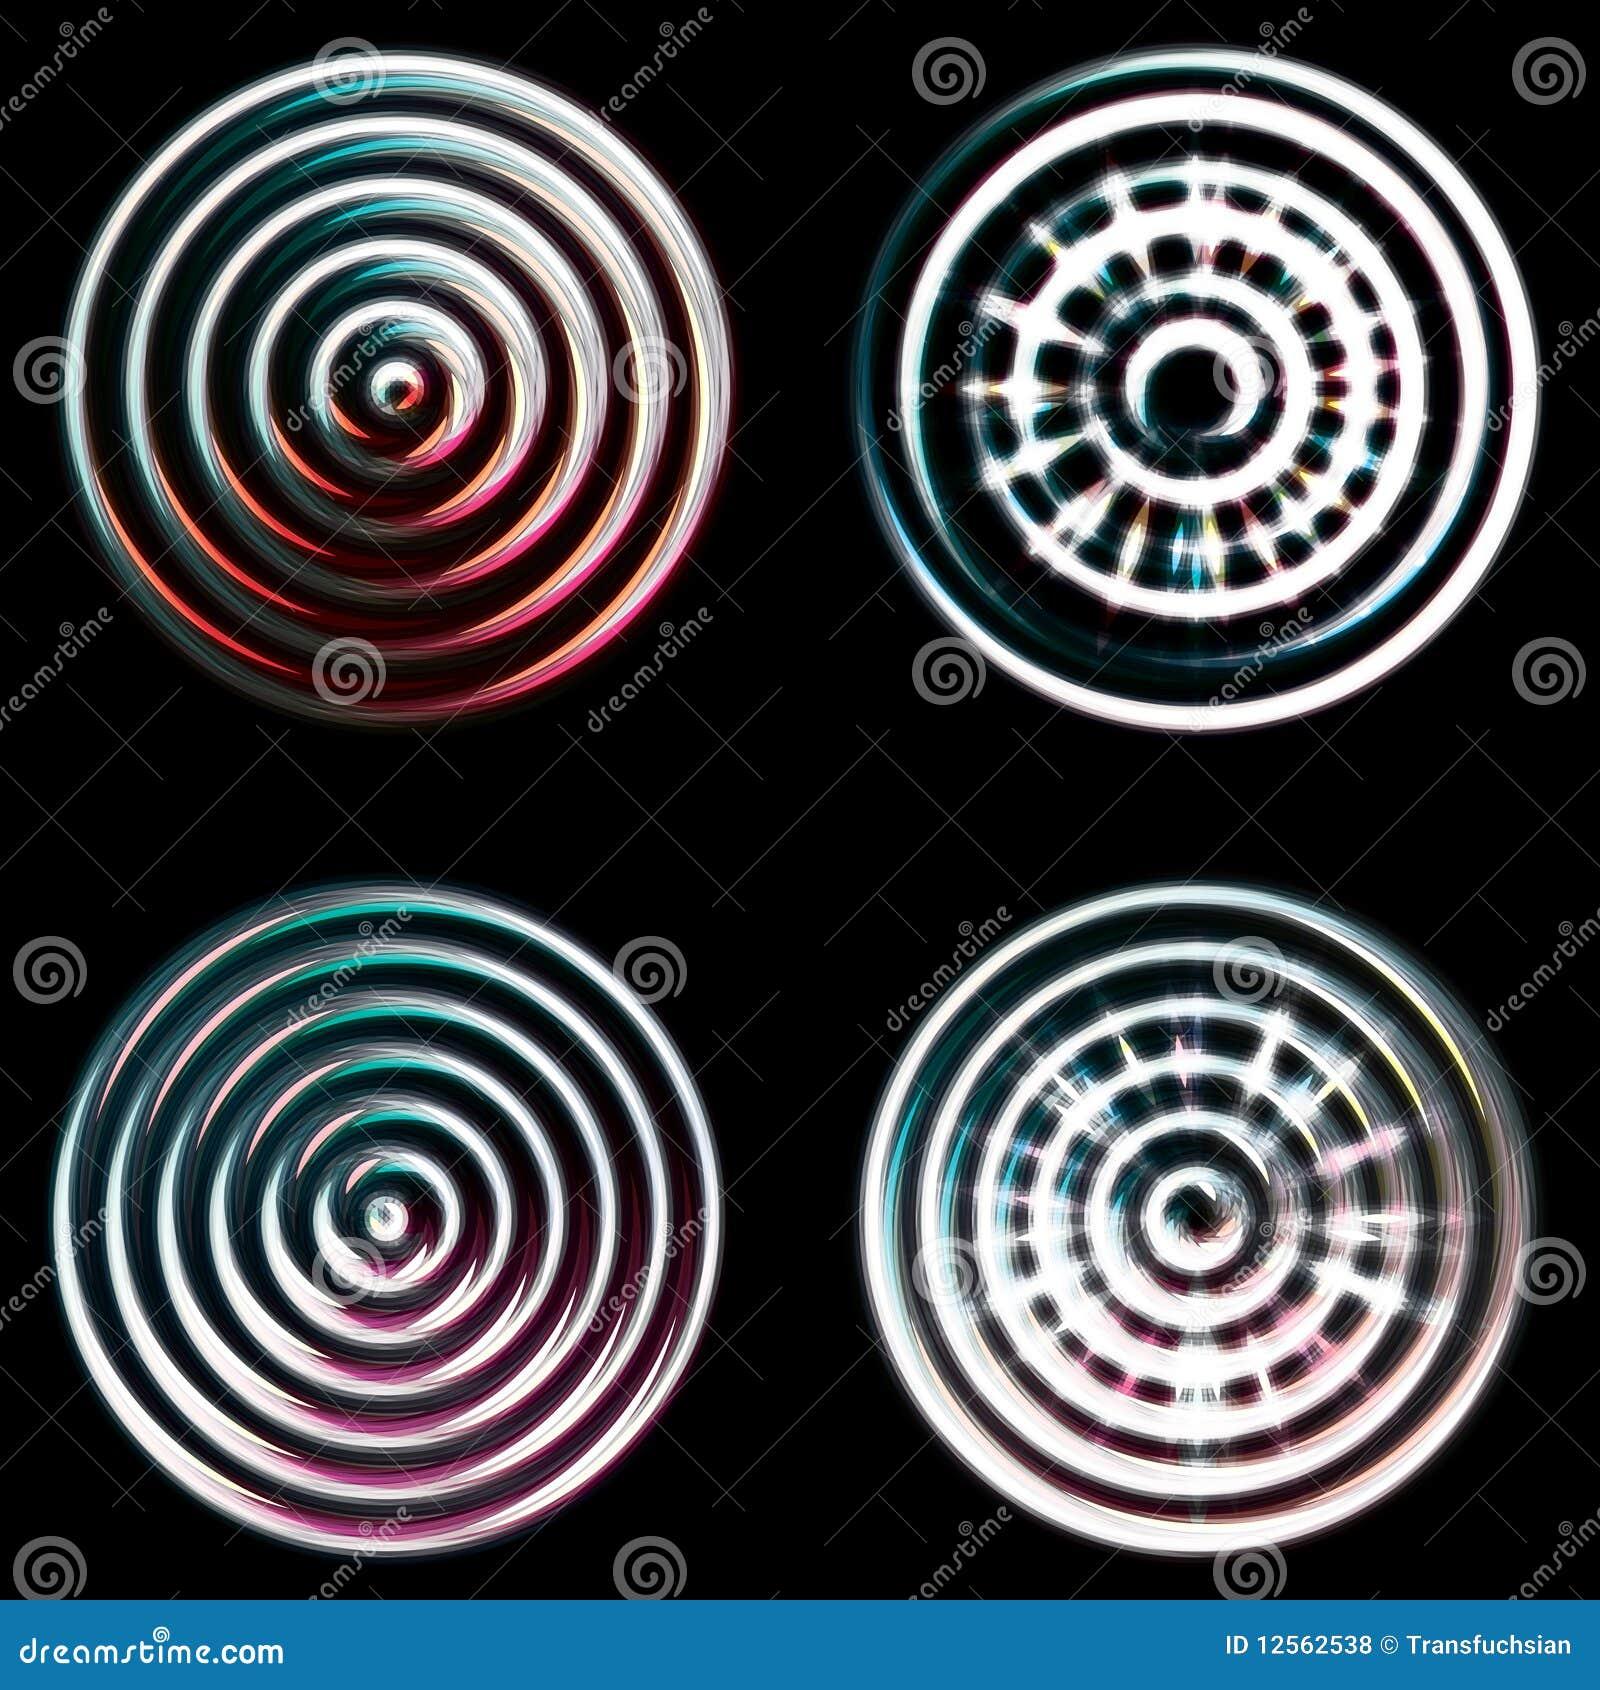 Abstract chrome circles